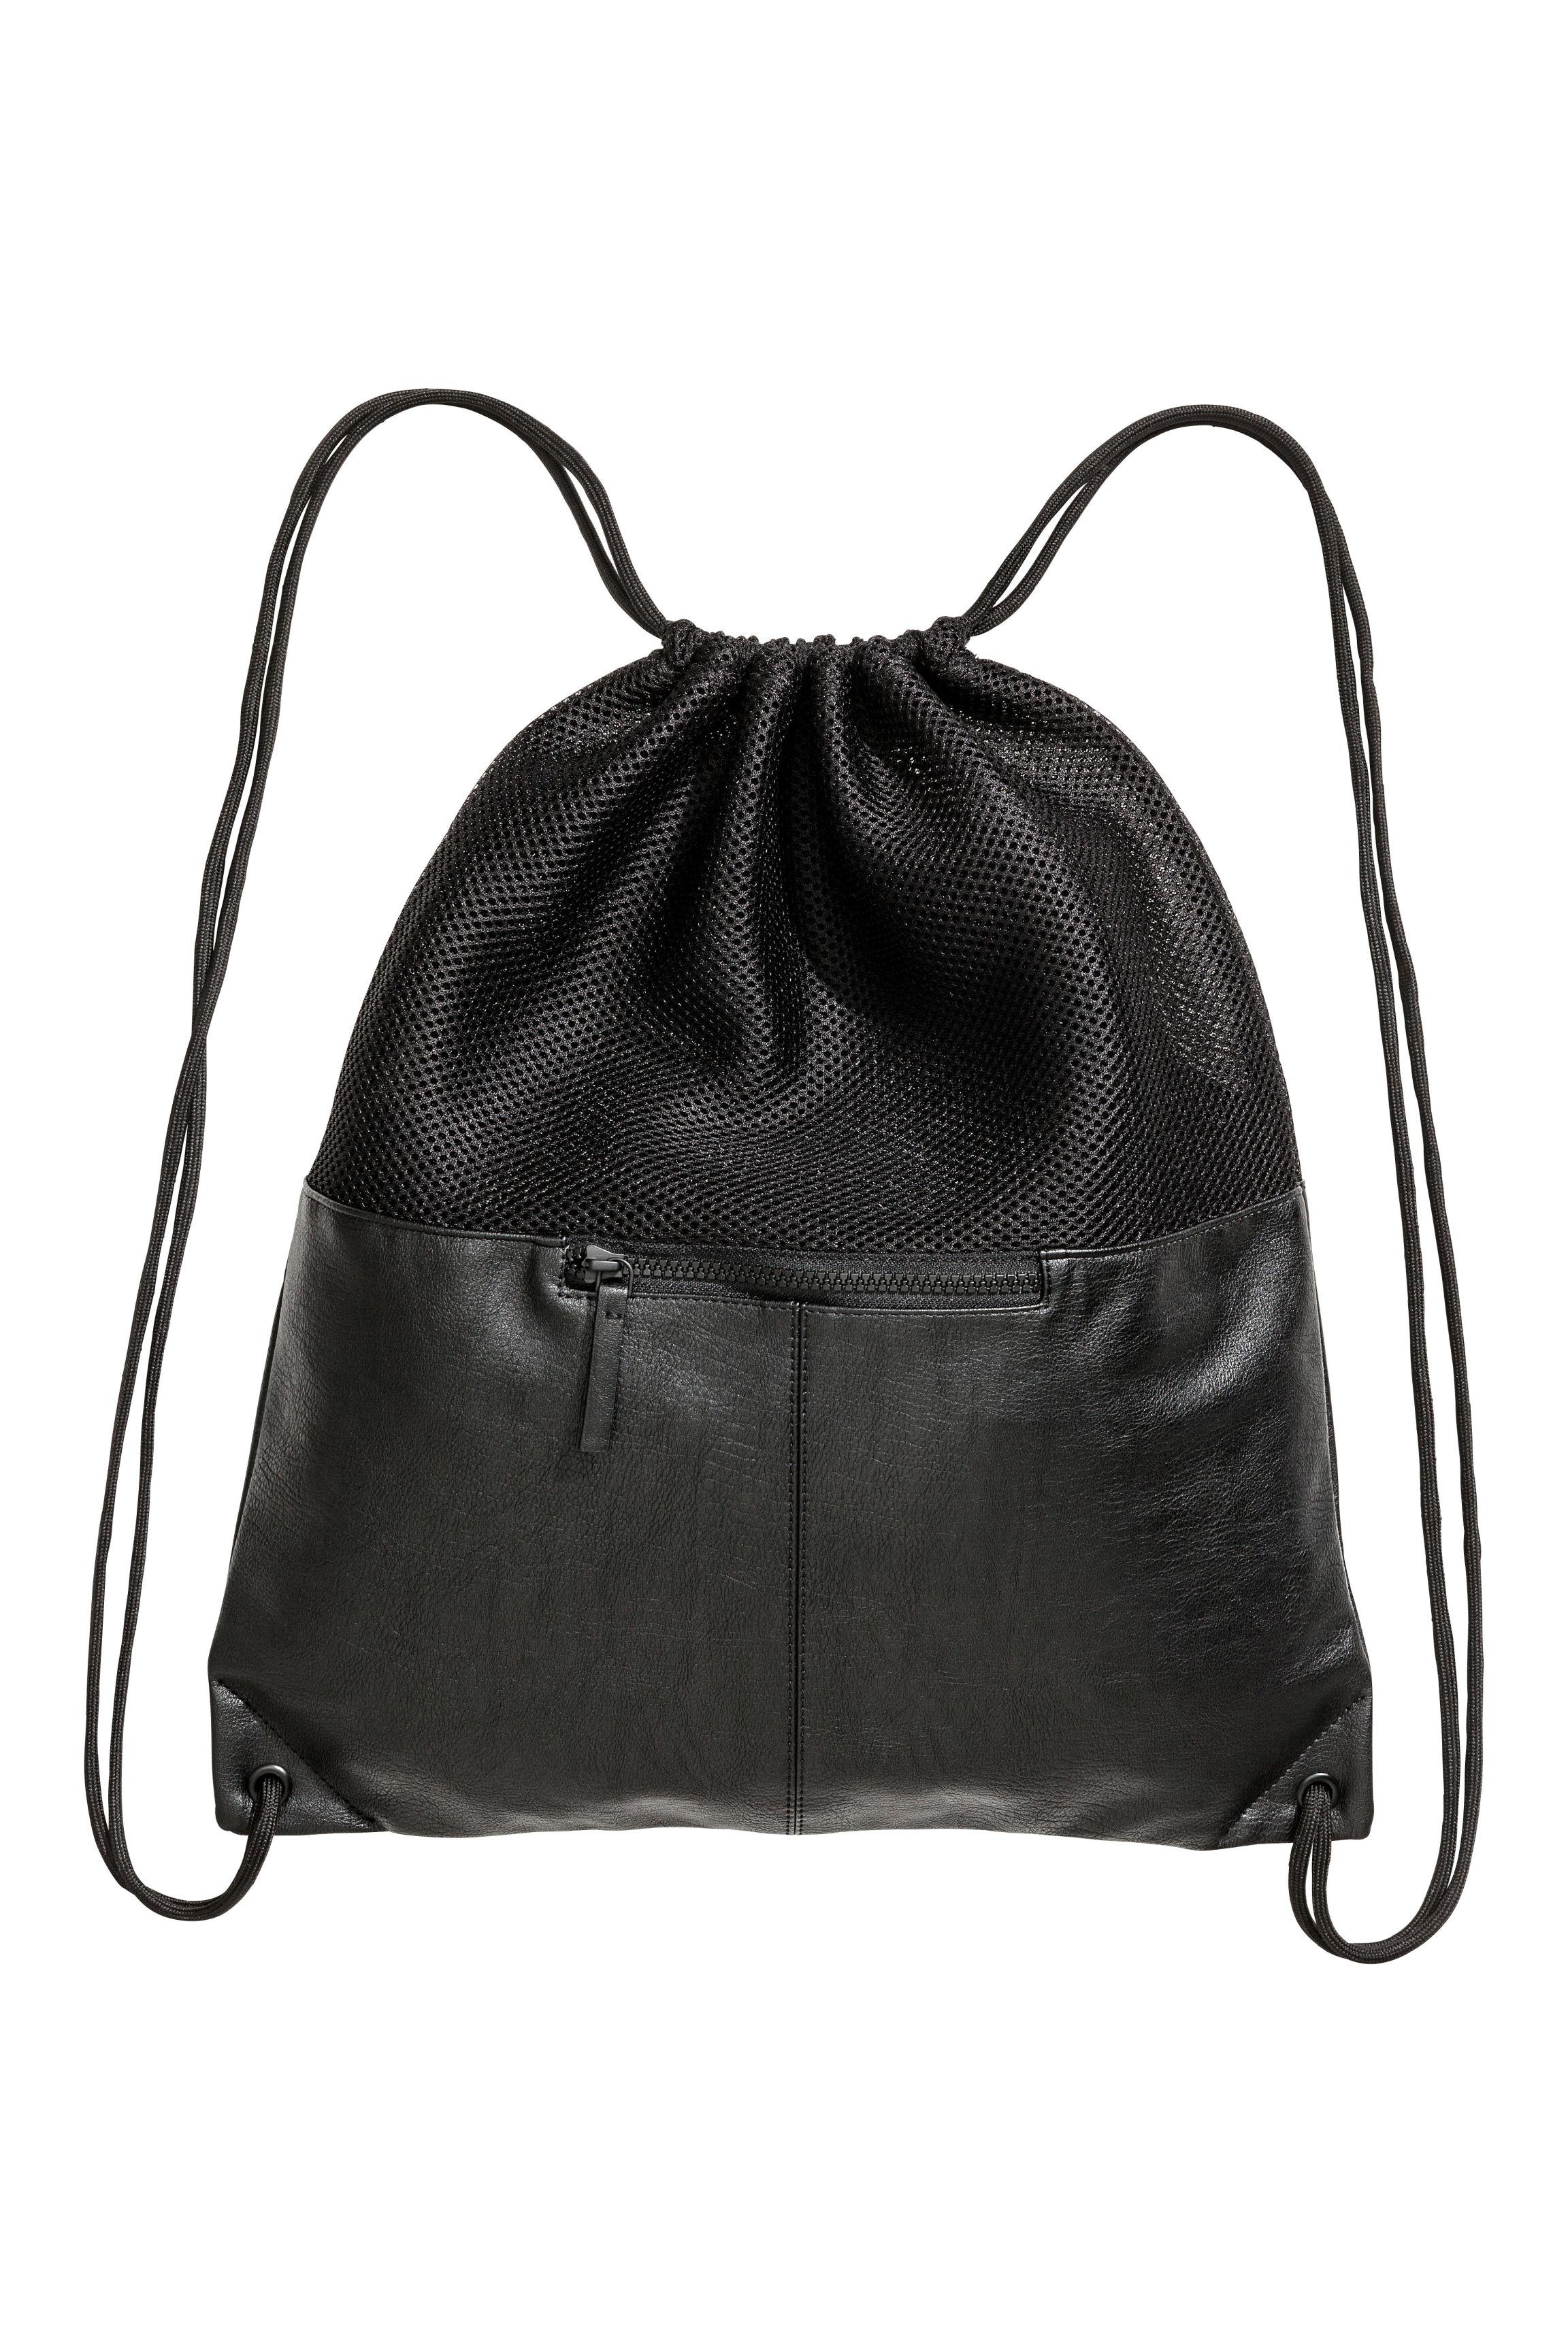 Mesh Gym Bag - Black - Men